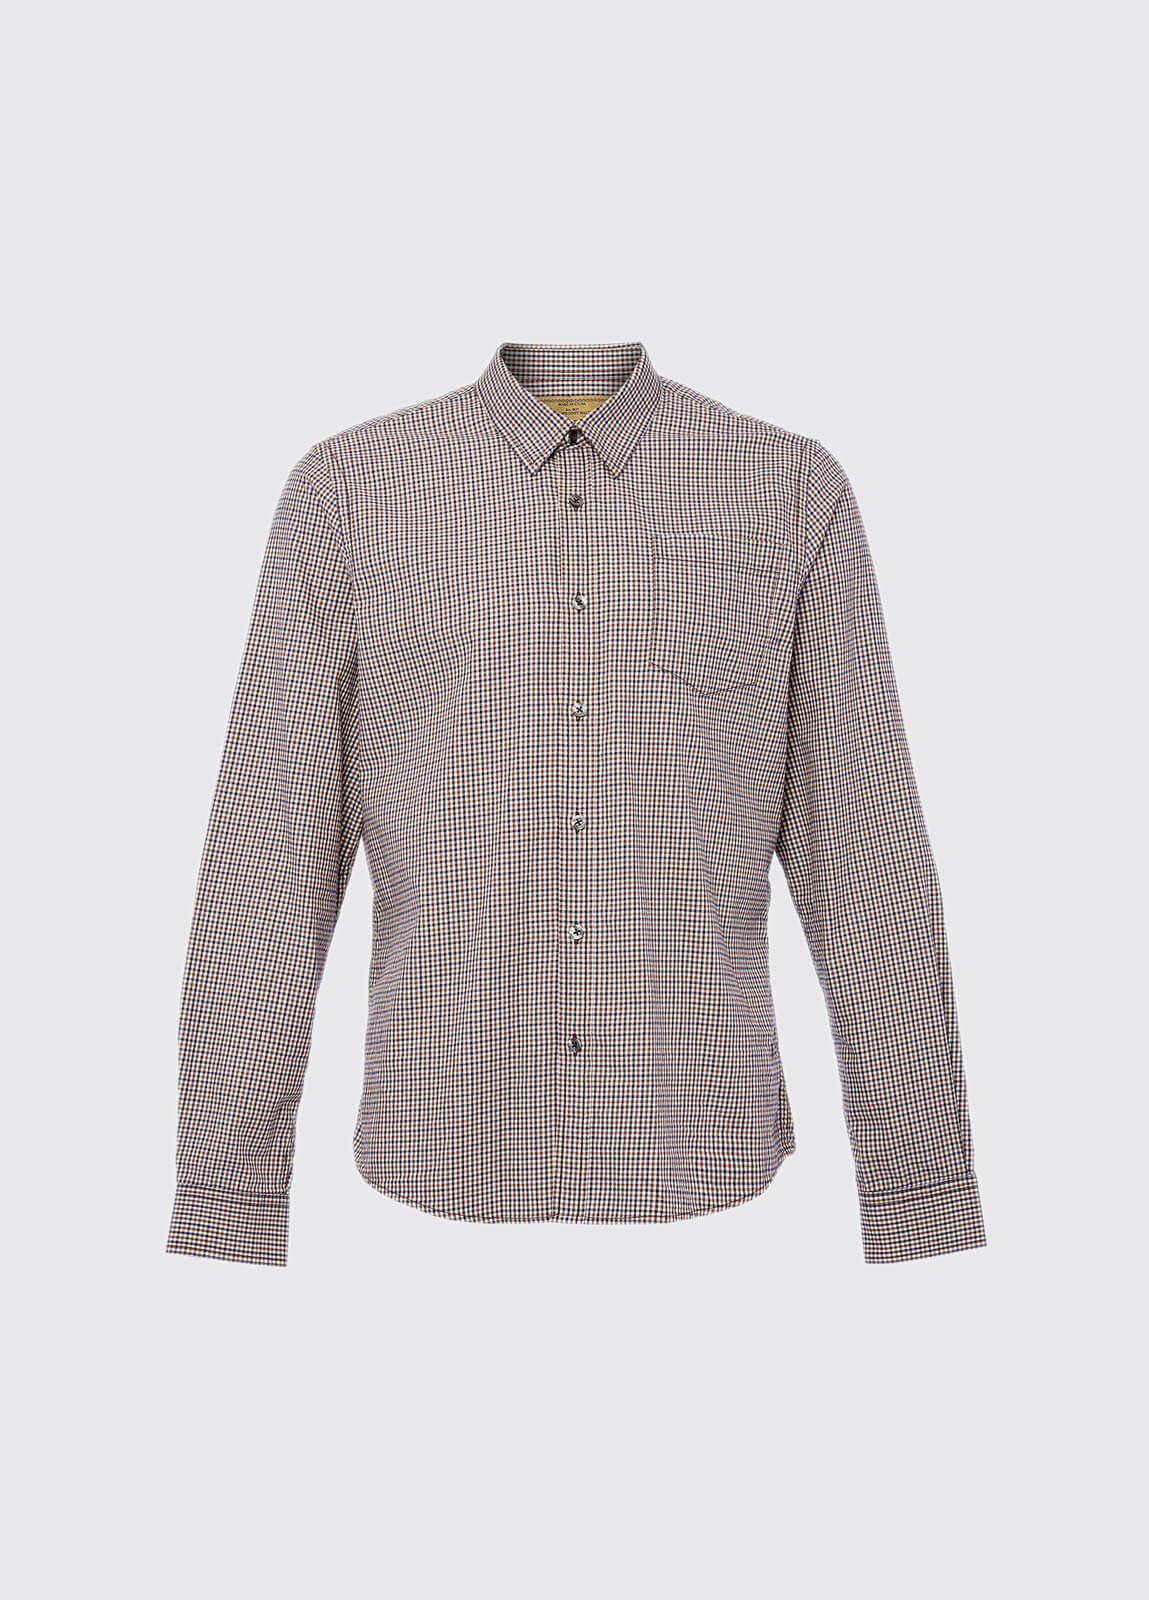 Celbridge Shirt - Cigar